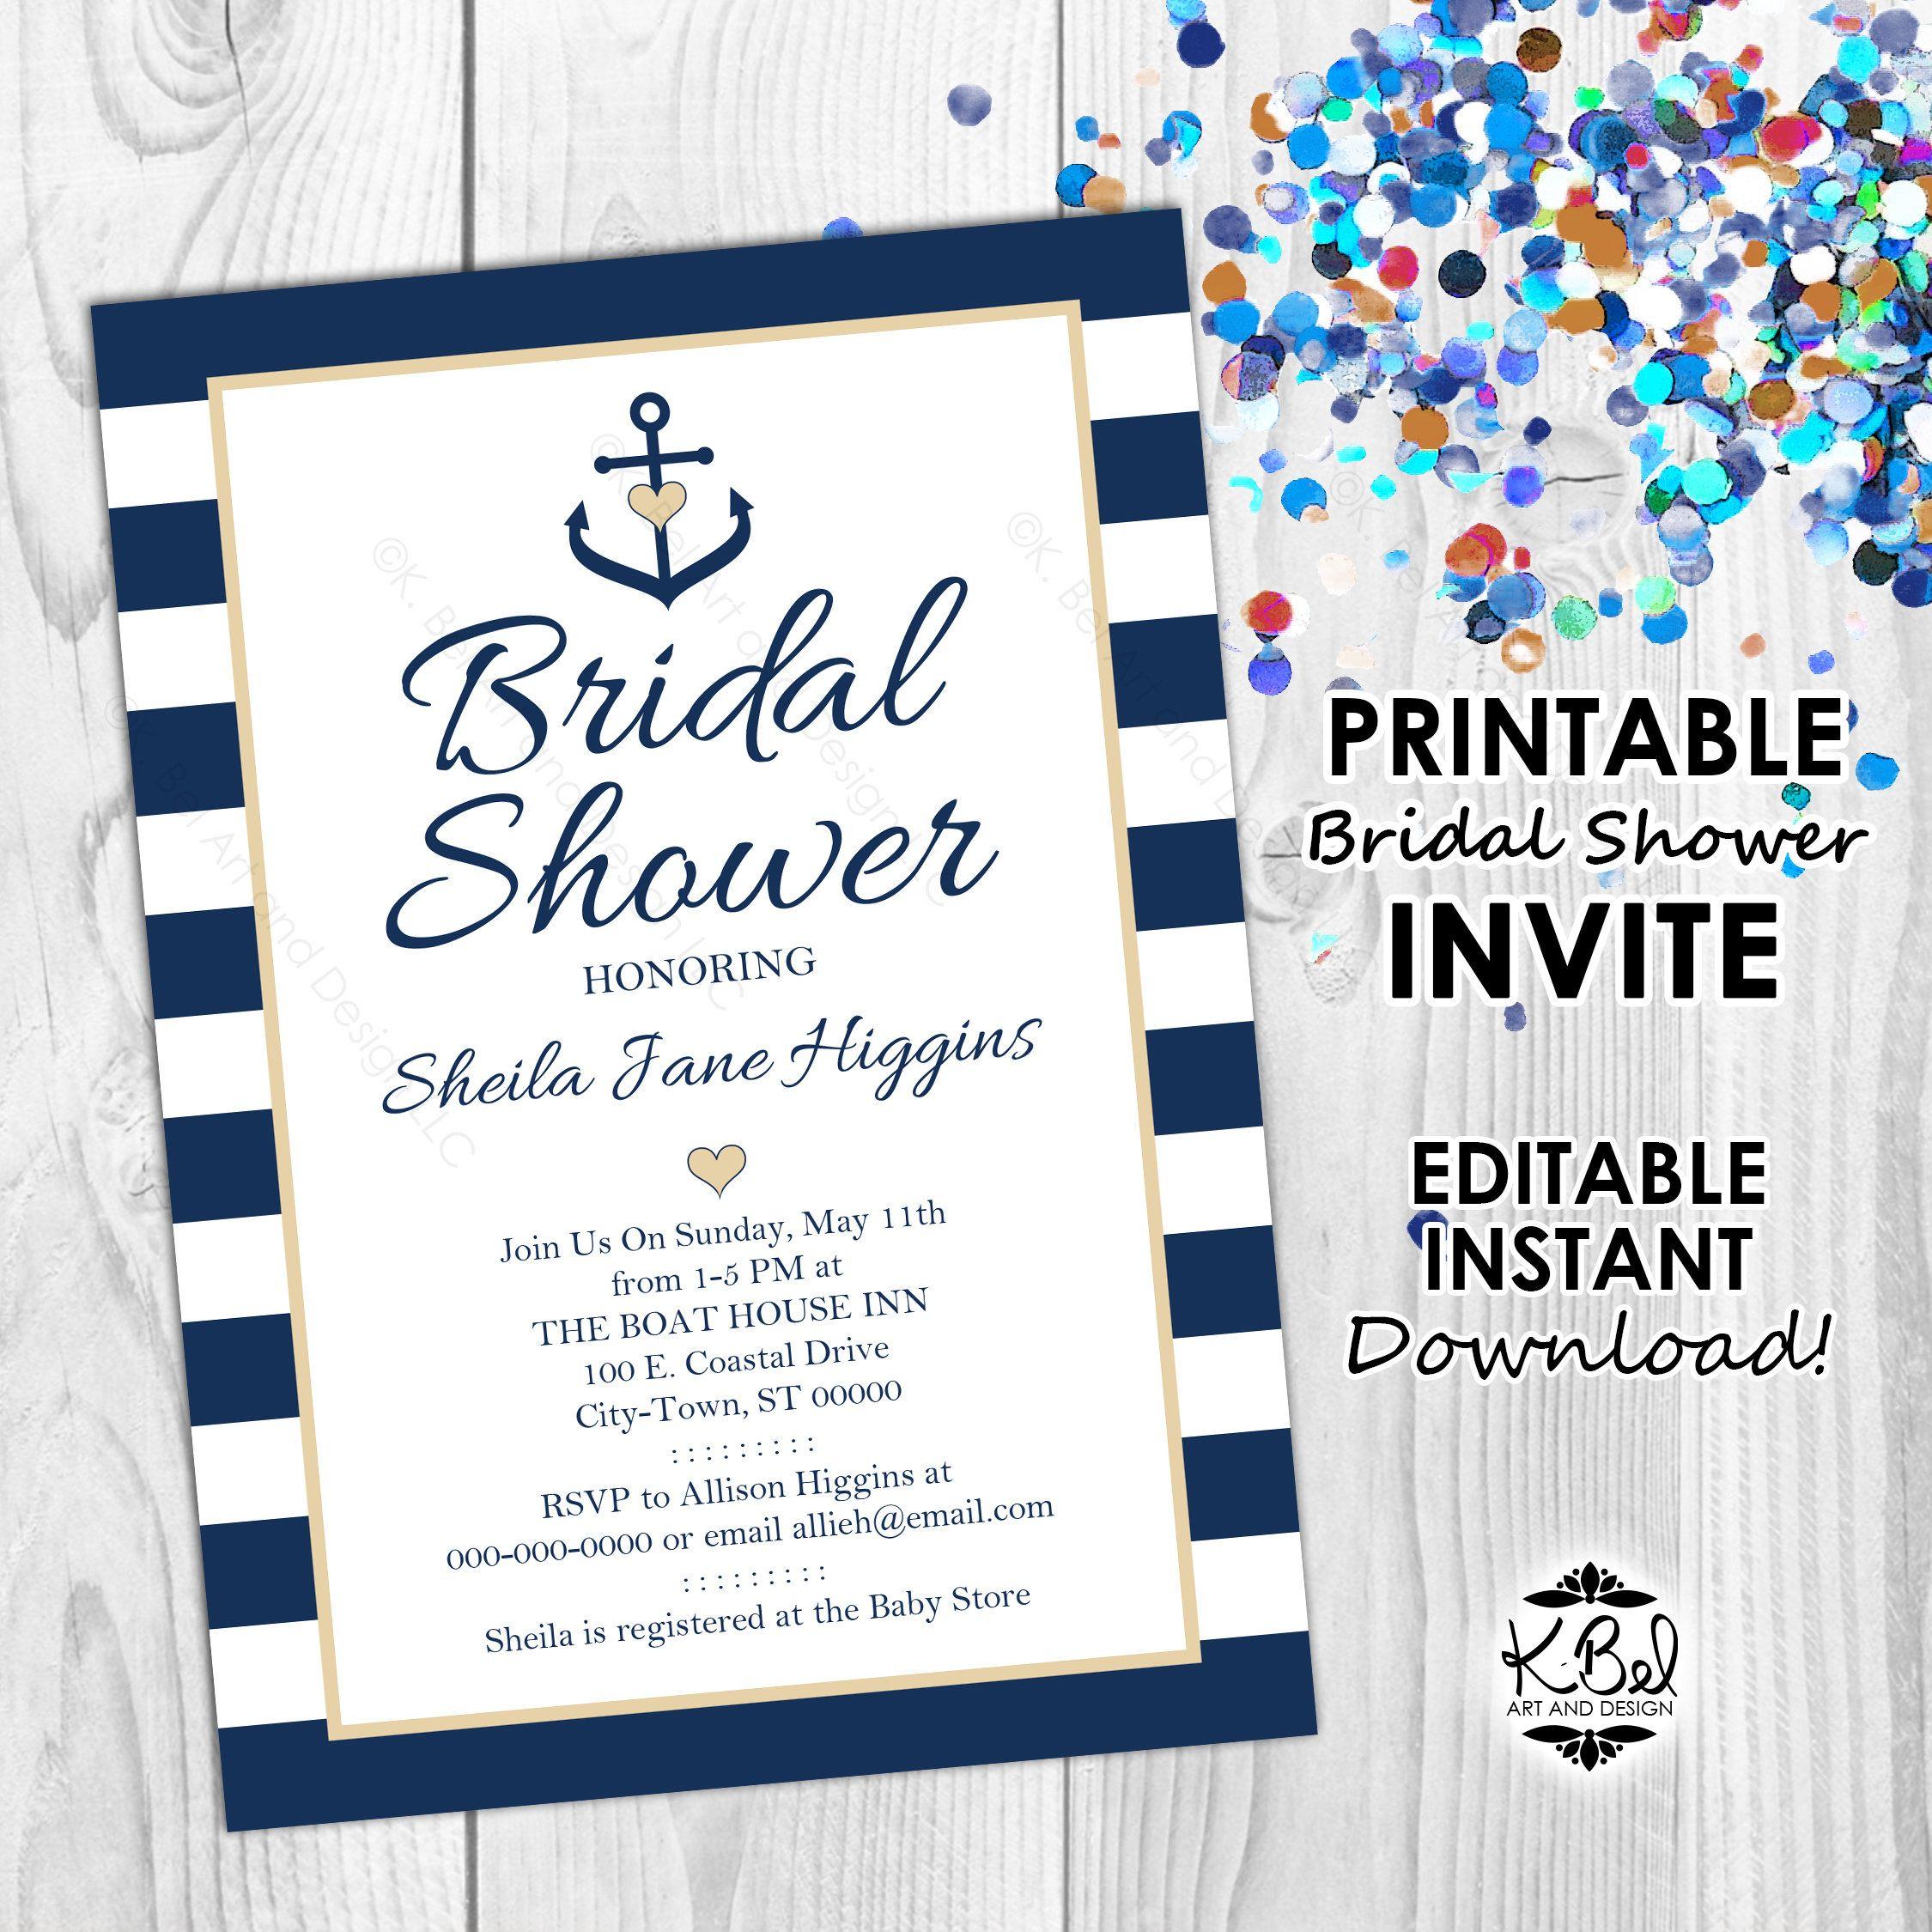 92746fb64d2c Printable Nautical Bridal Shower Invite - Editable Invitation - Nautical  themed Editable Invite - Anchor Invite - INSTANT DOWNLOAD - Digital by  KBelDigital ...